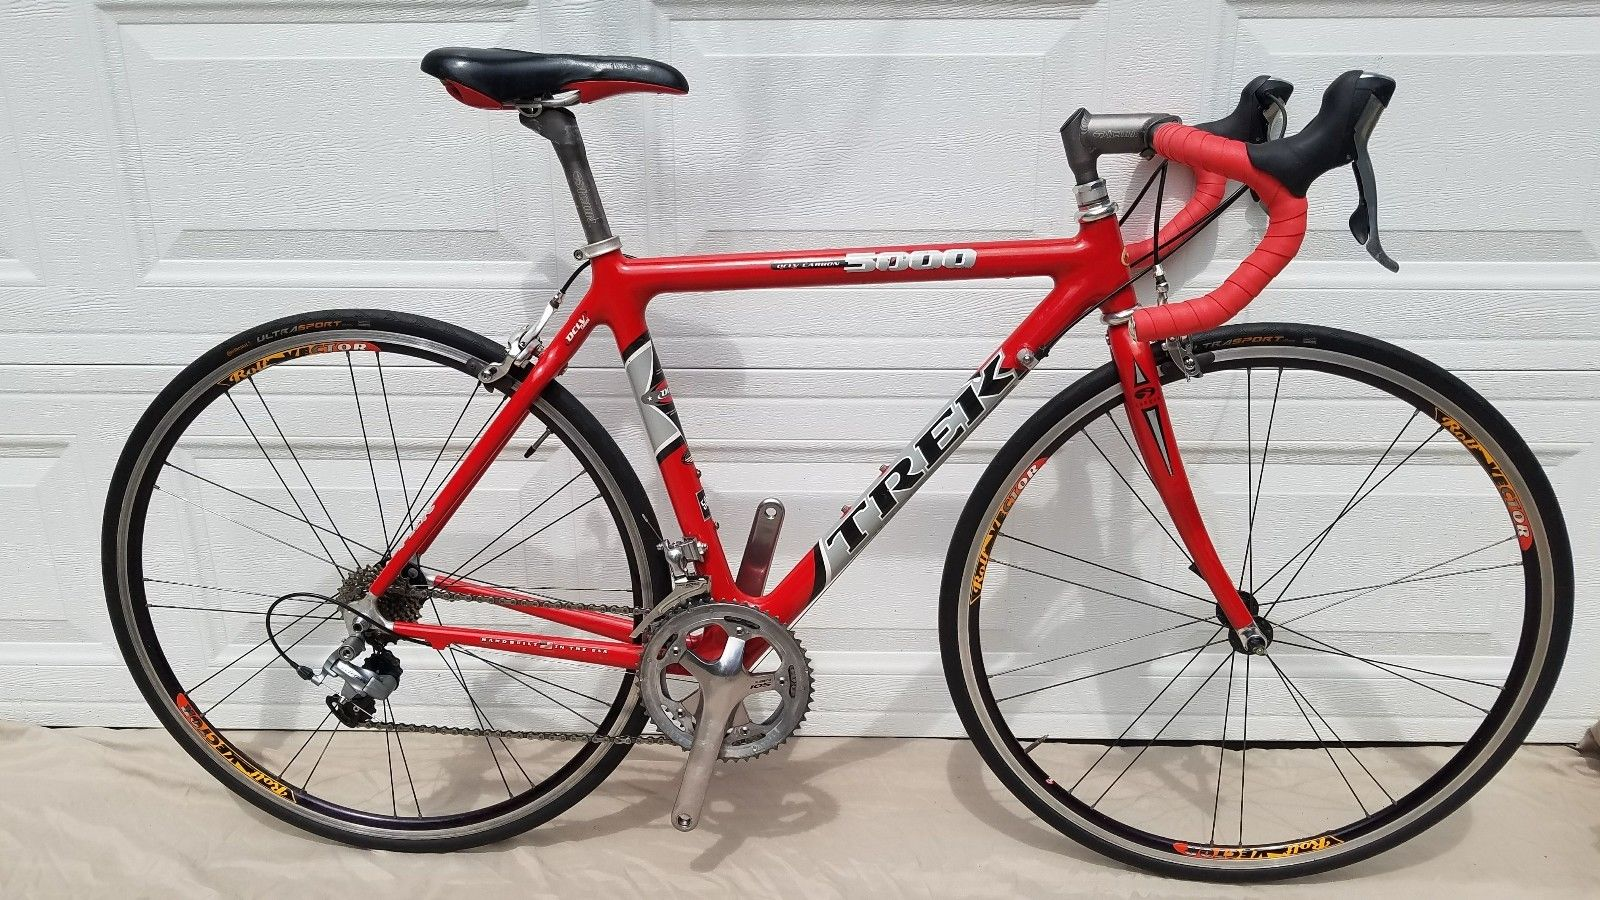 700C Road Bike 18 Speed Carbon Fiber Frame R3000 Racing Bicycle 50cm PresentGift